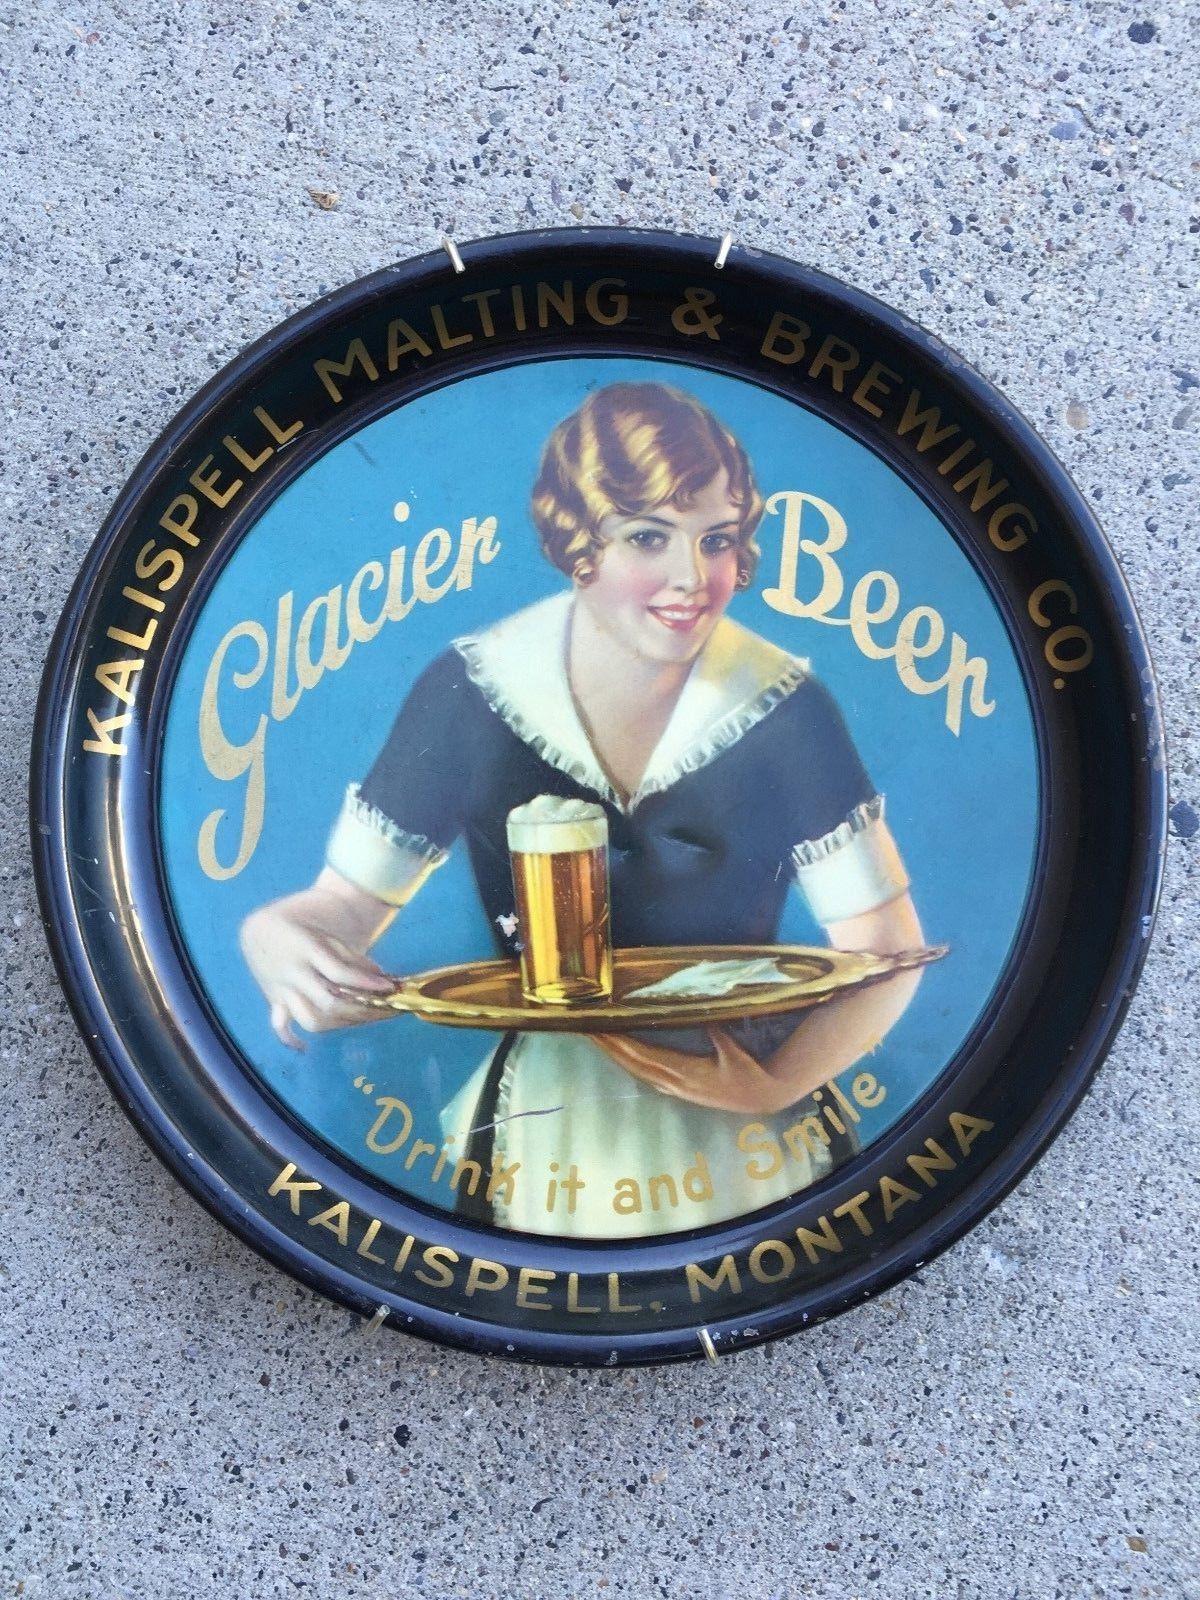 Glacier Beer Kalispell, Montana Vintage beer labels